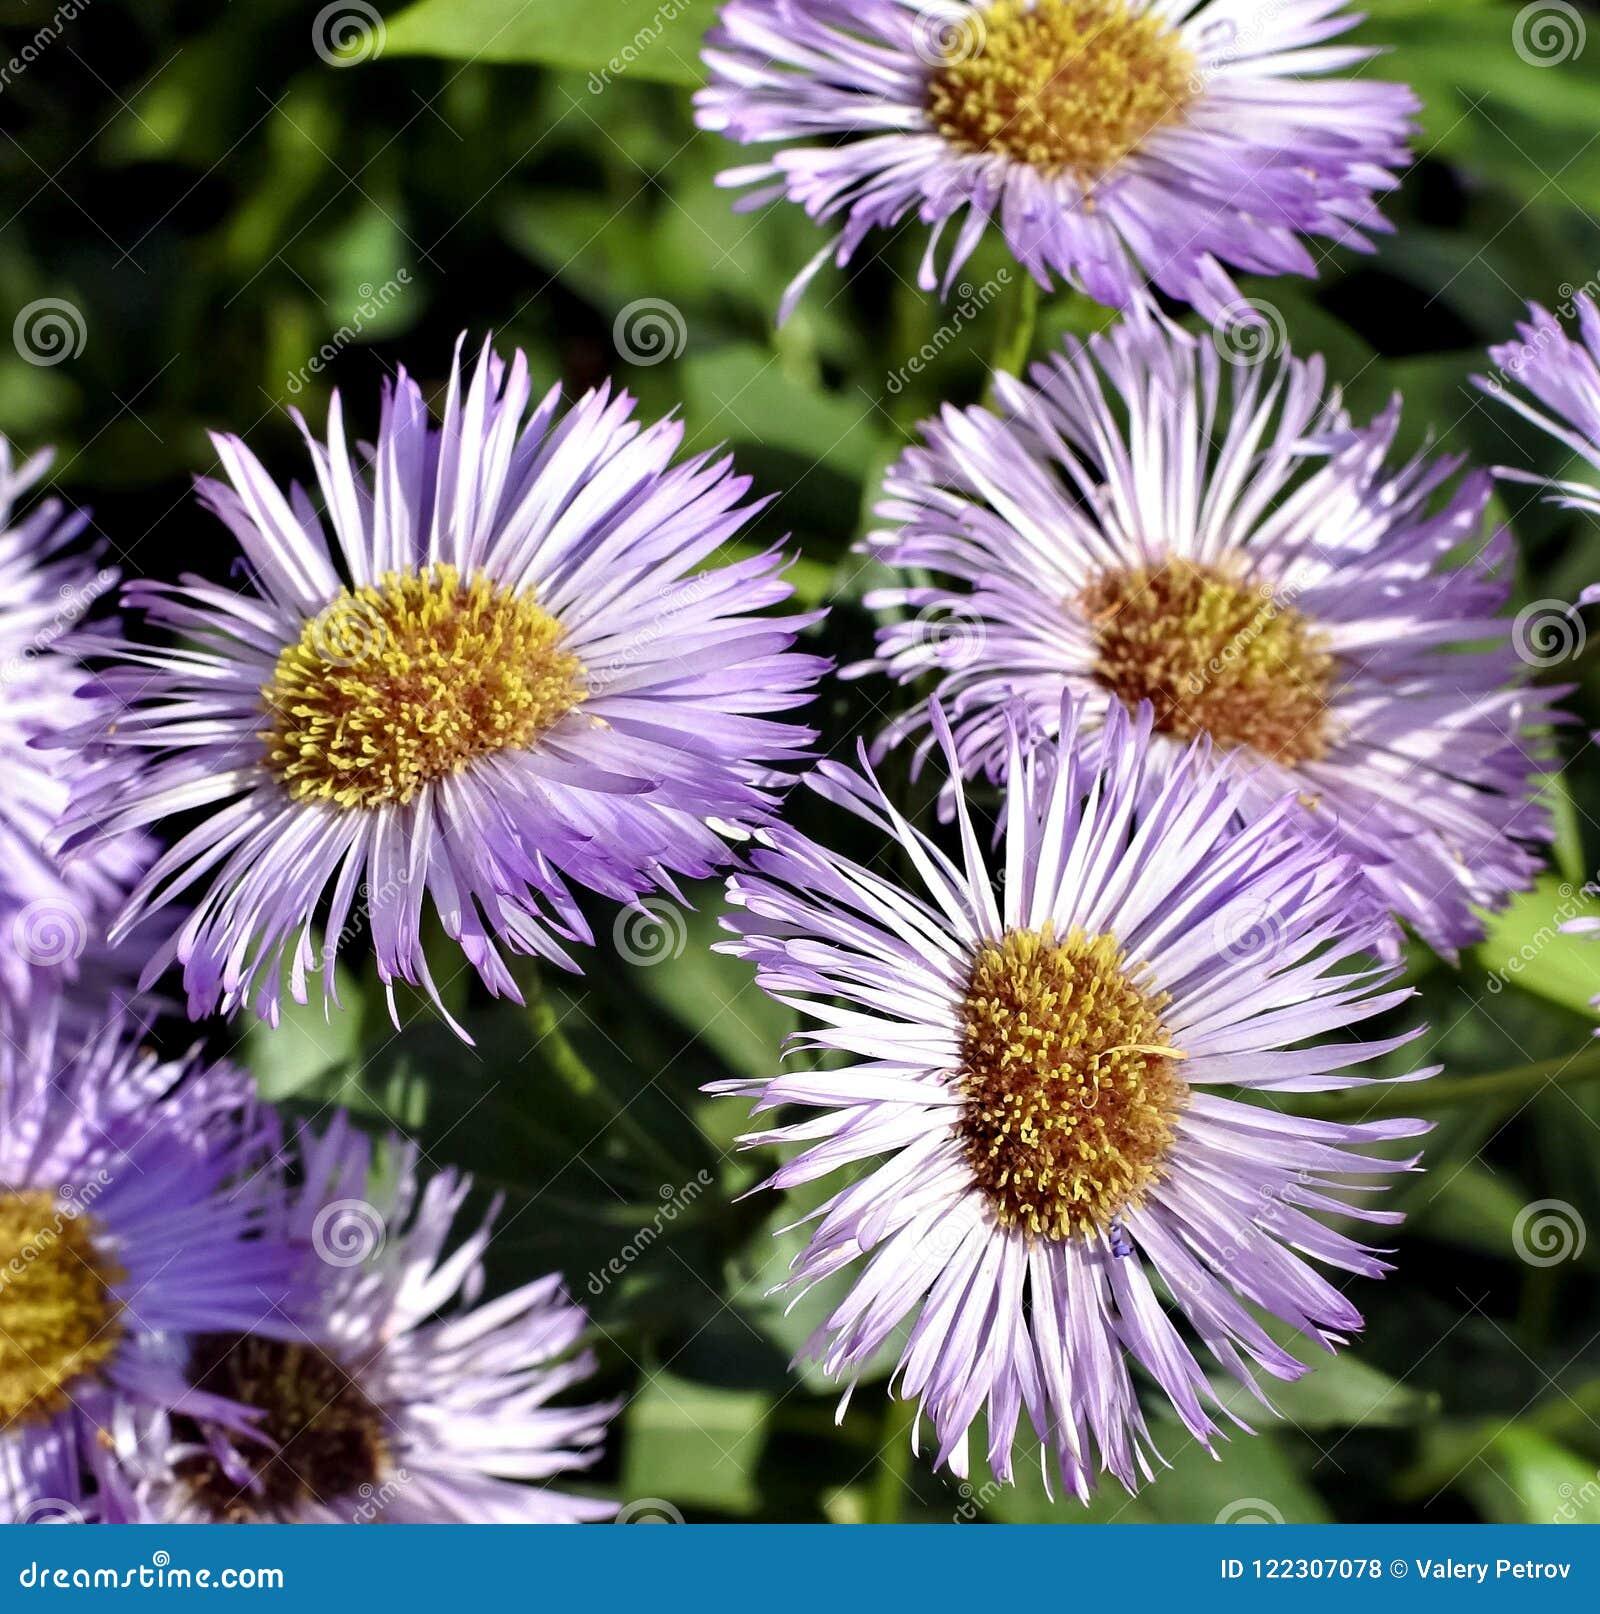 Beautiful Flowers Melkolepestnik Stock Photo Image Of Season